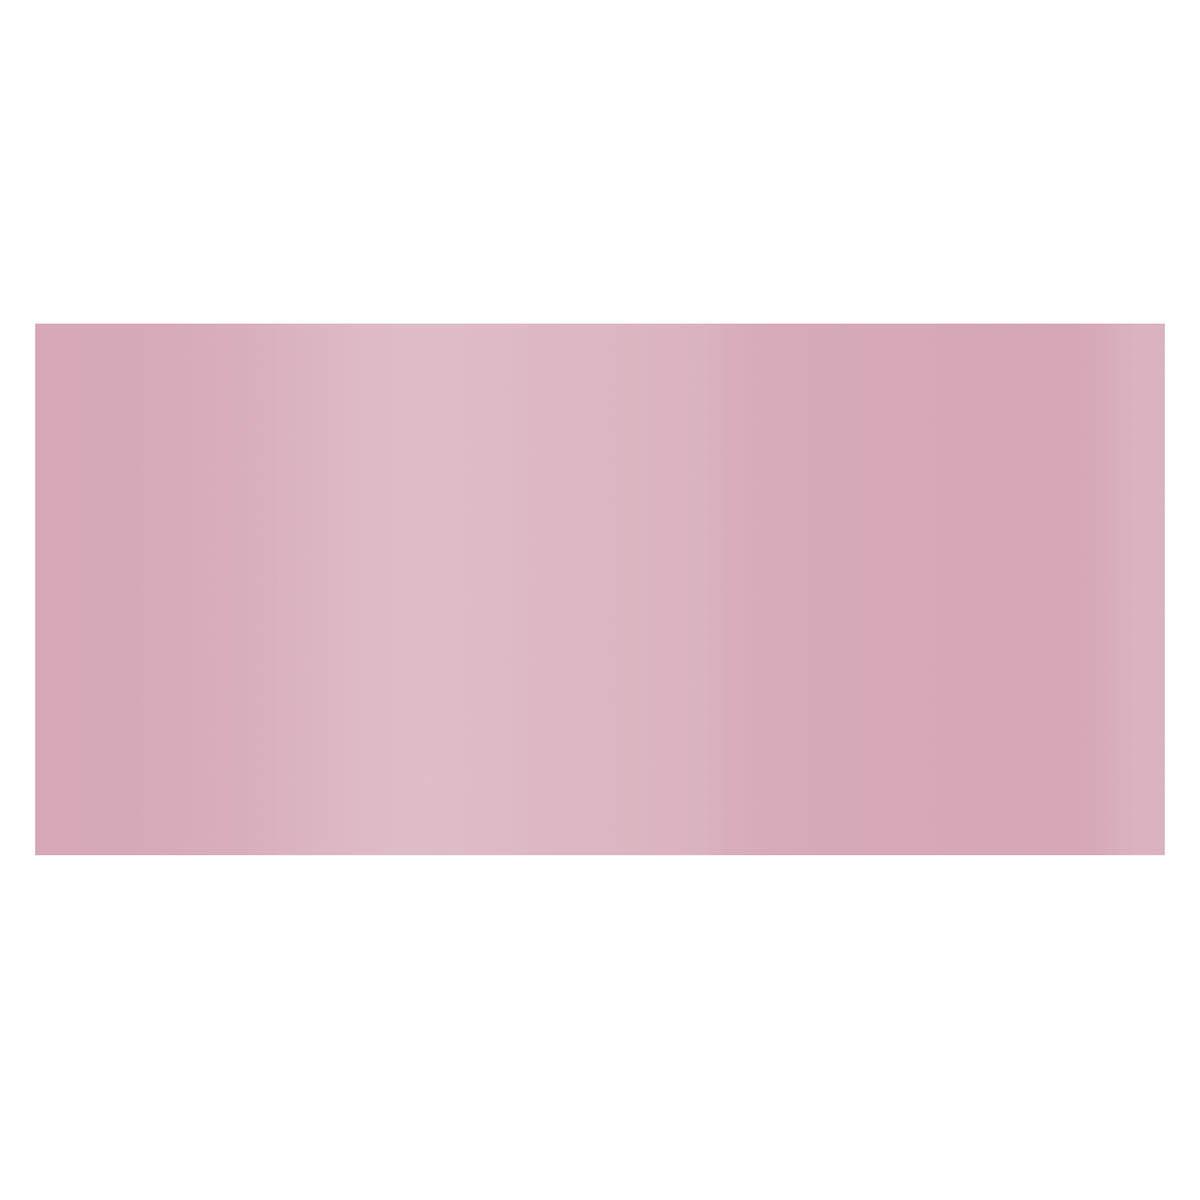 Waverly ® Inspirations Metallic Multi-Surface Acrylic Paint - Rose Quartz, 2 oz. - 60693E